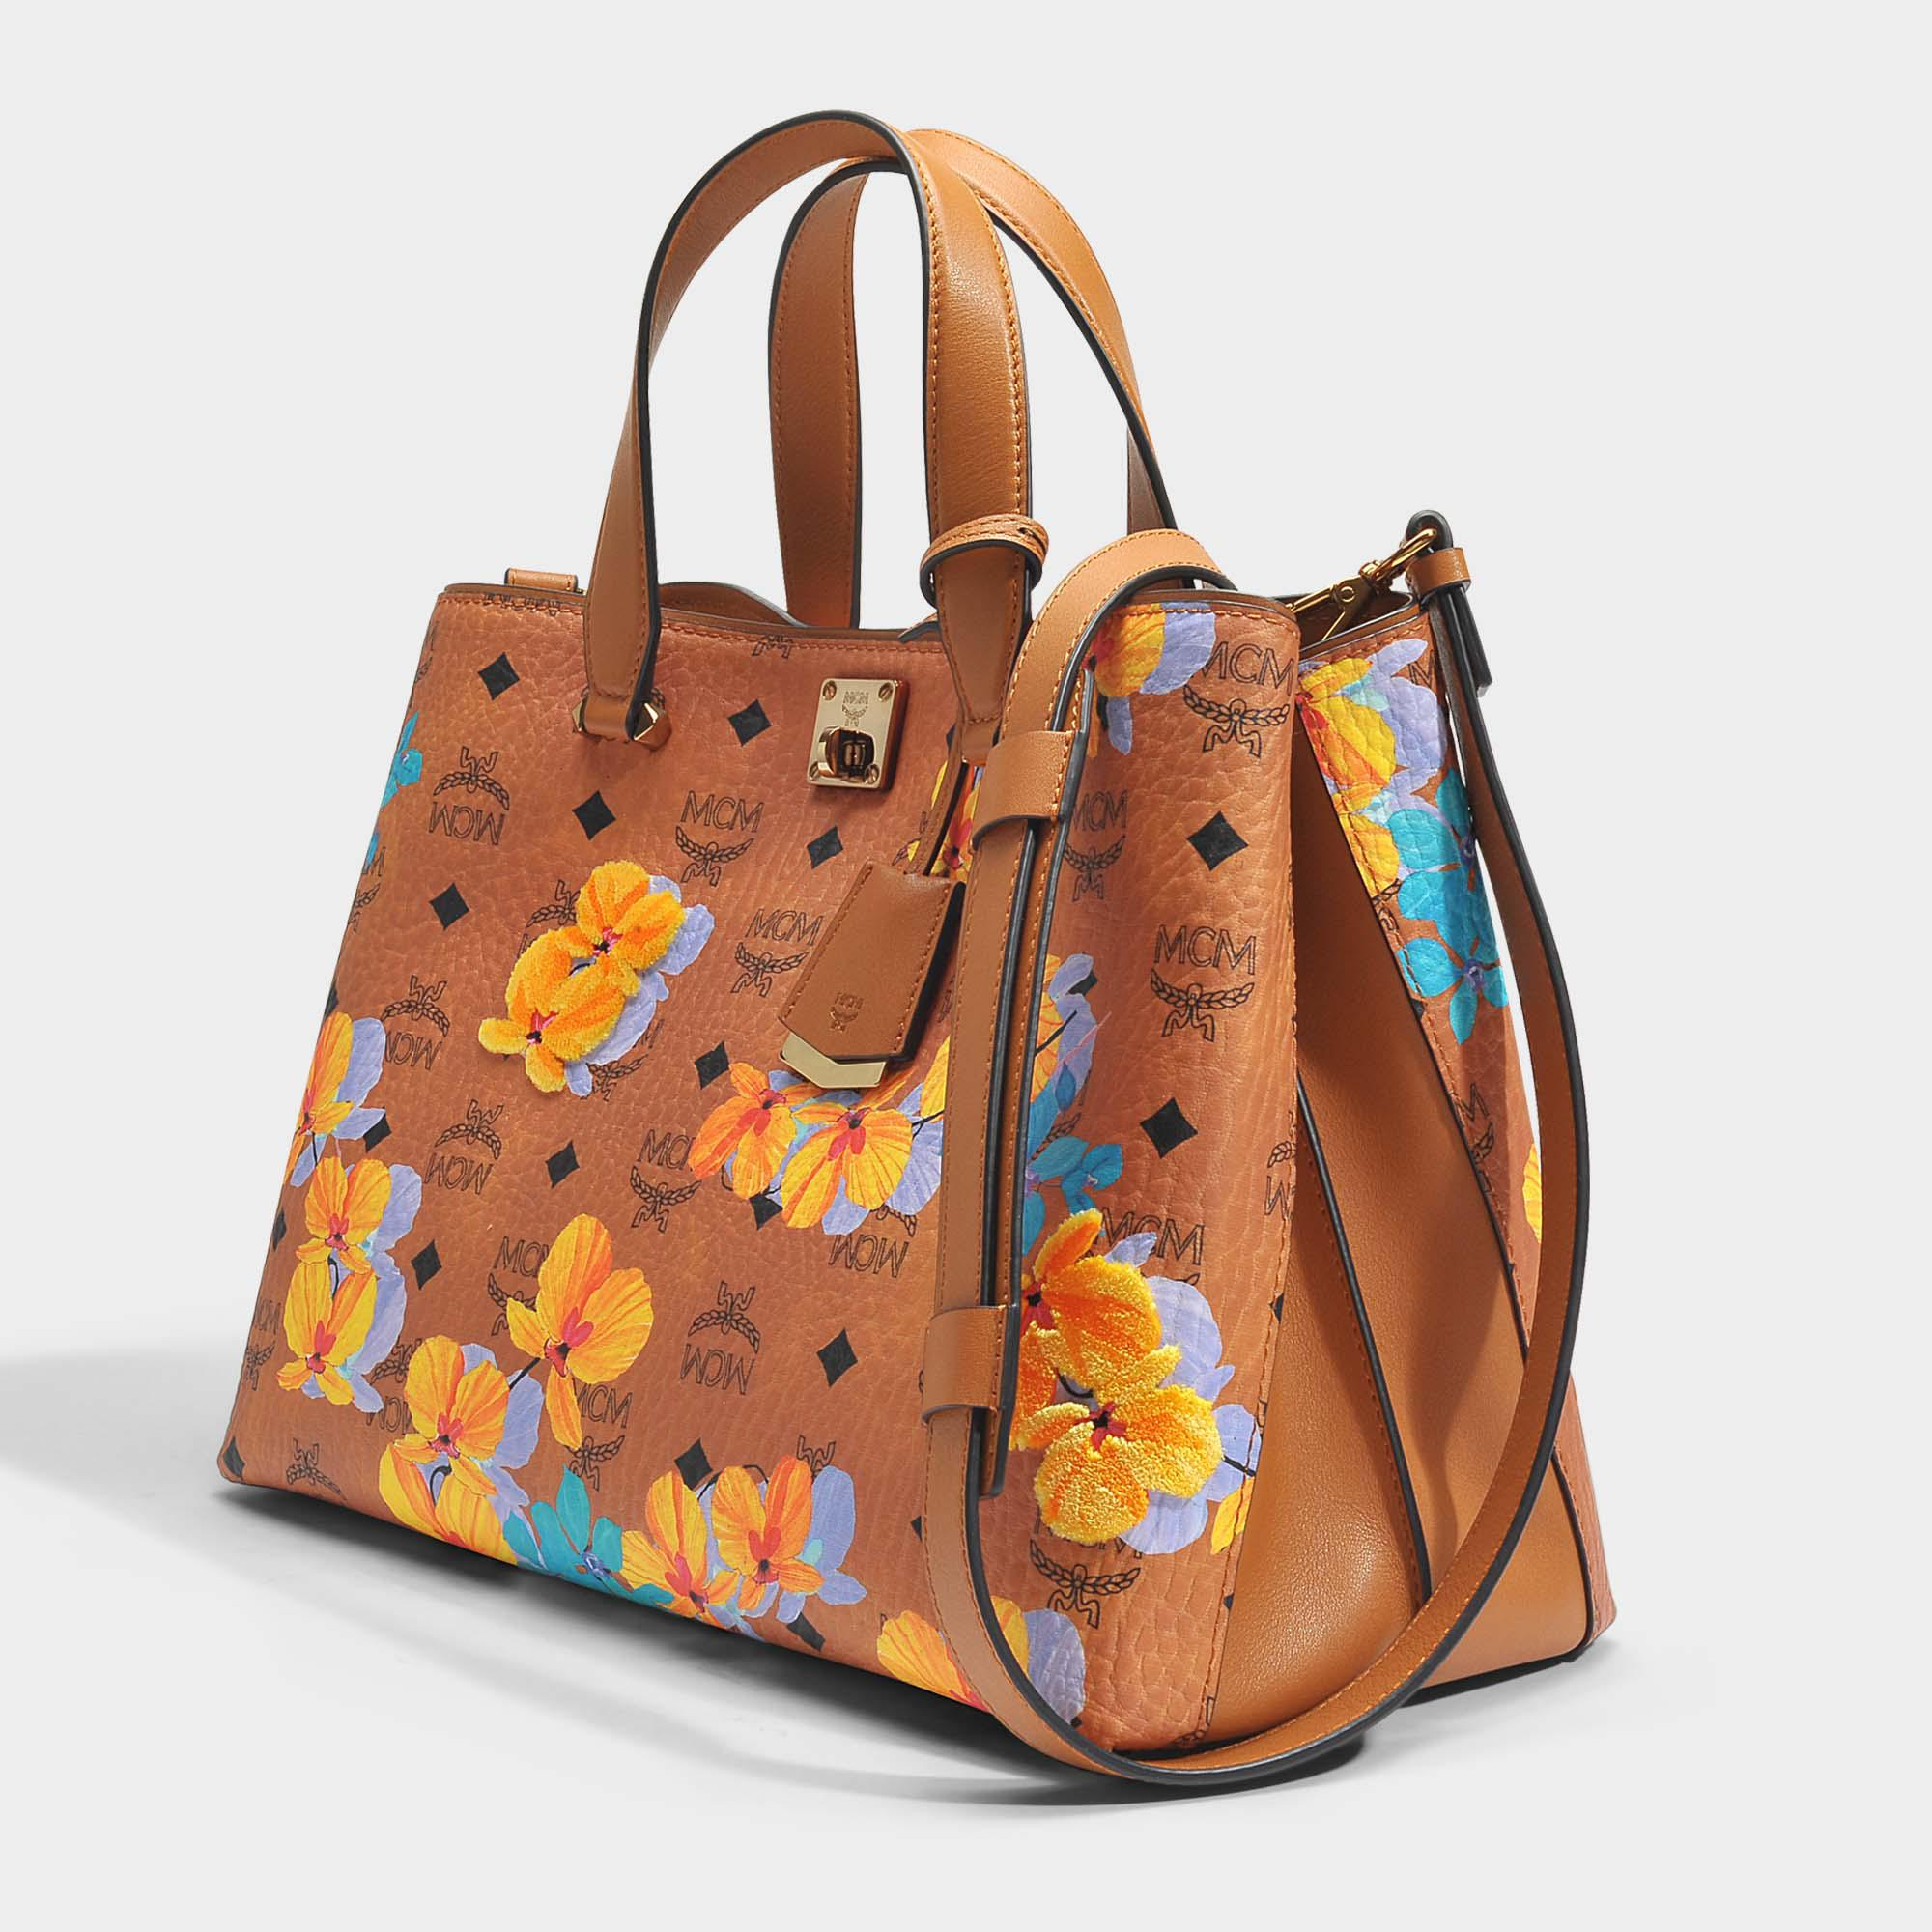 MCM Sac Shopping Flower Medium en Coton Enduit Cognac c2YNl5lDW